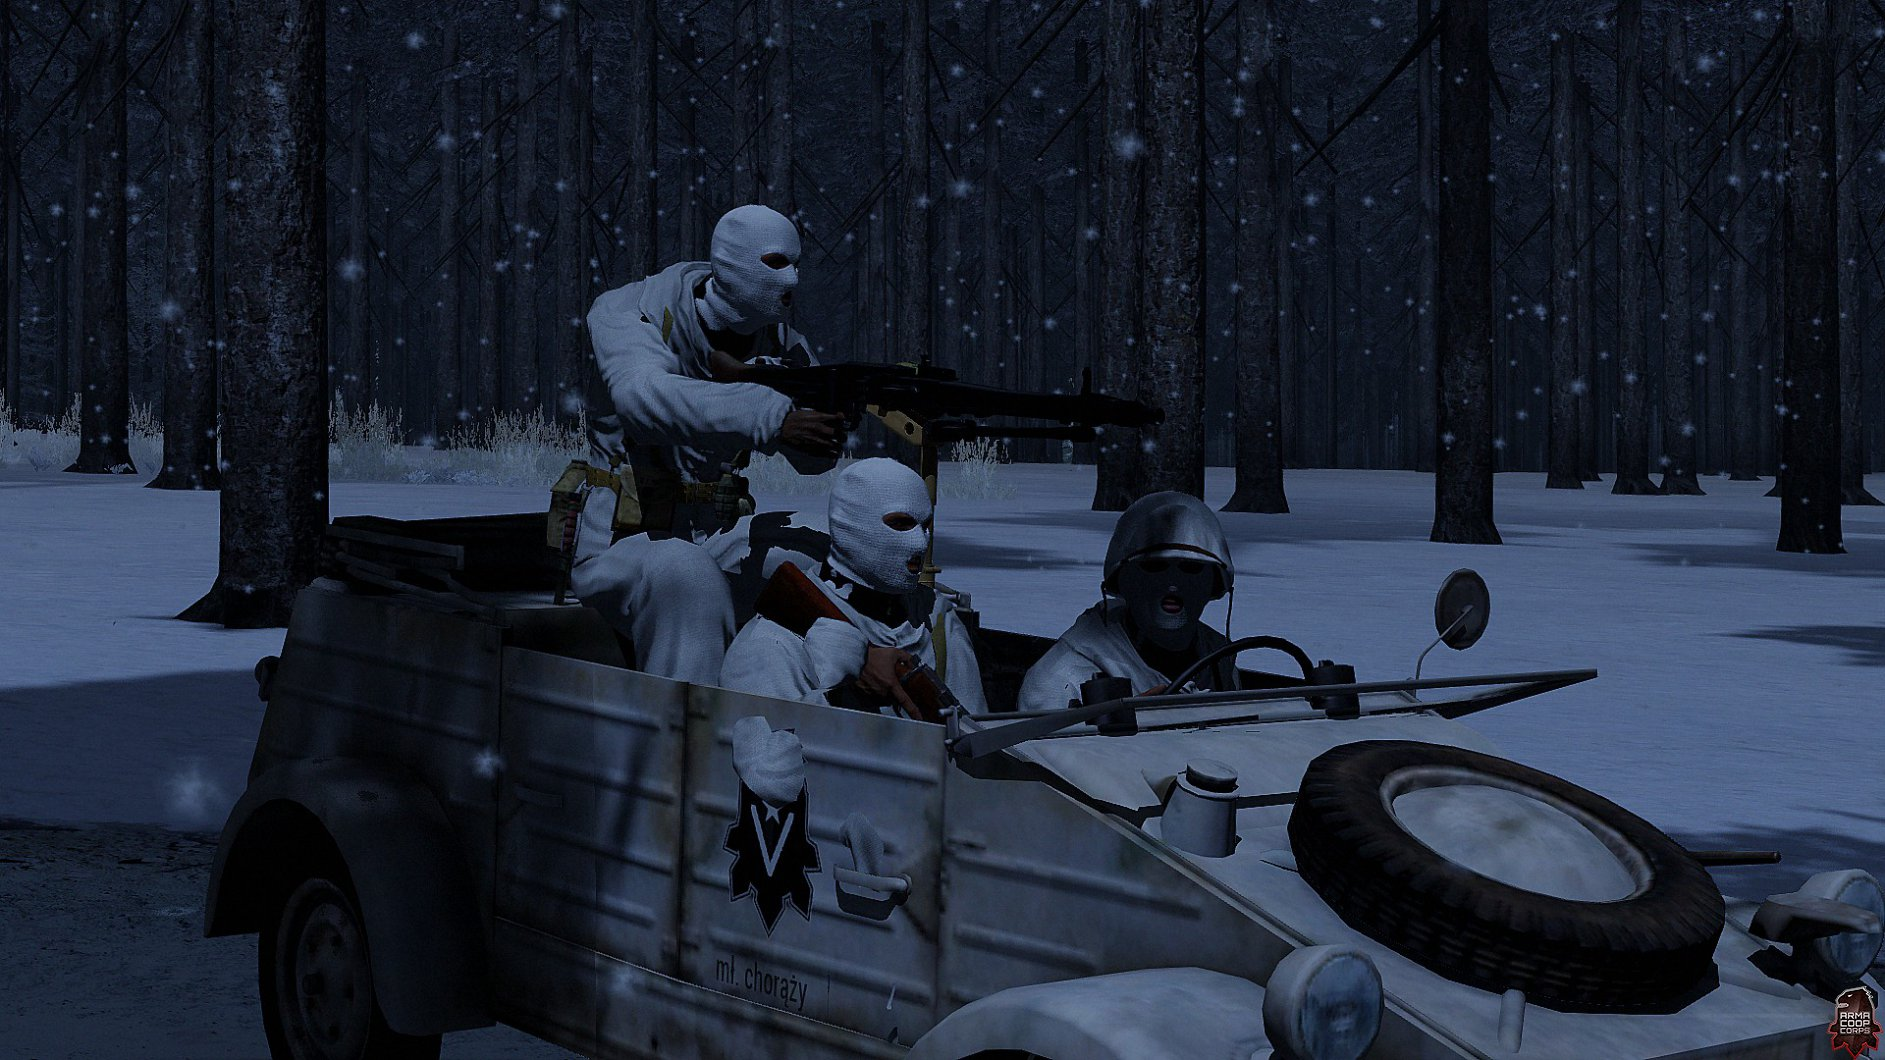 Operation Snowball